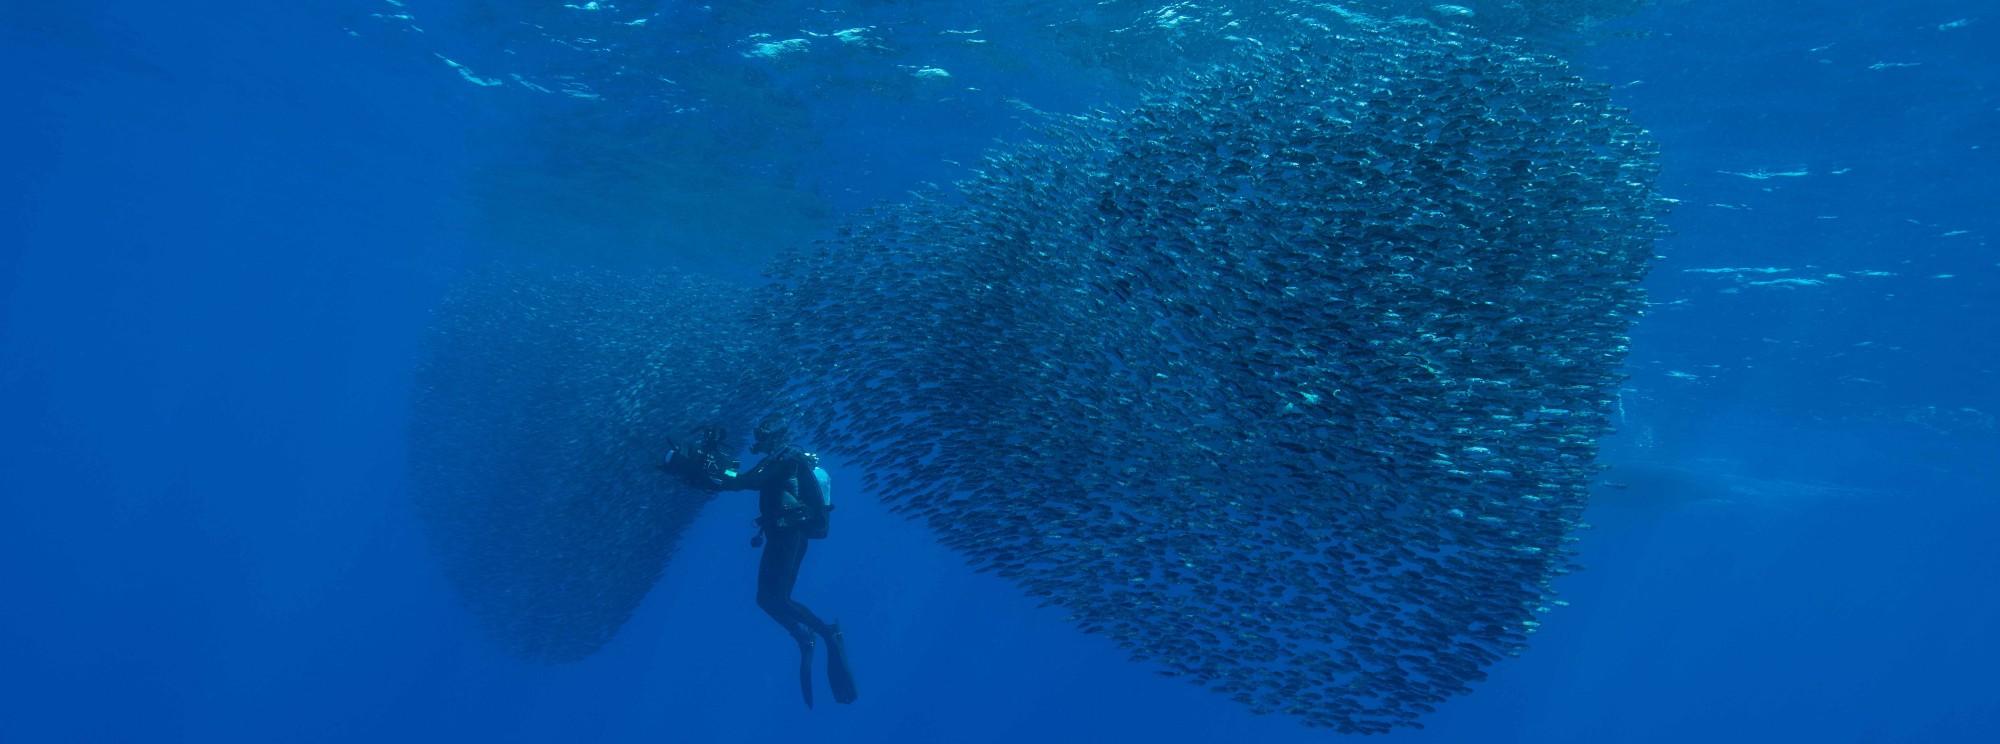 Rene heuzey underwater cinematographer